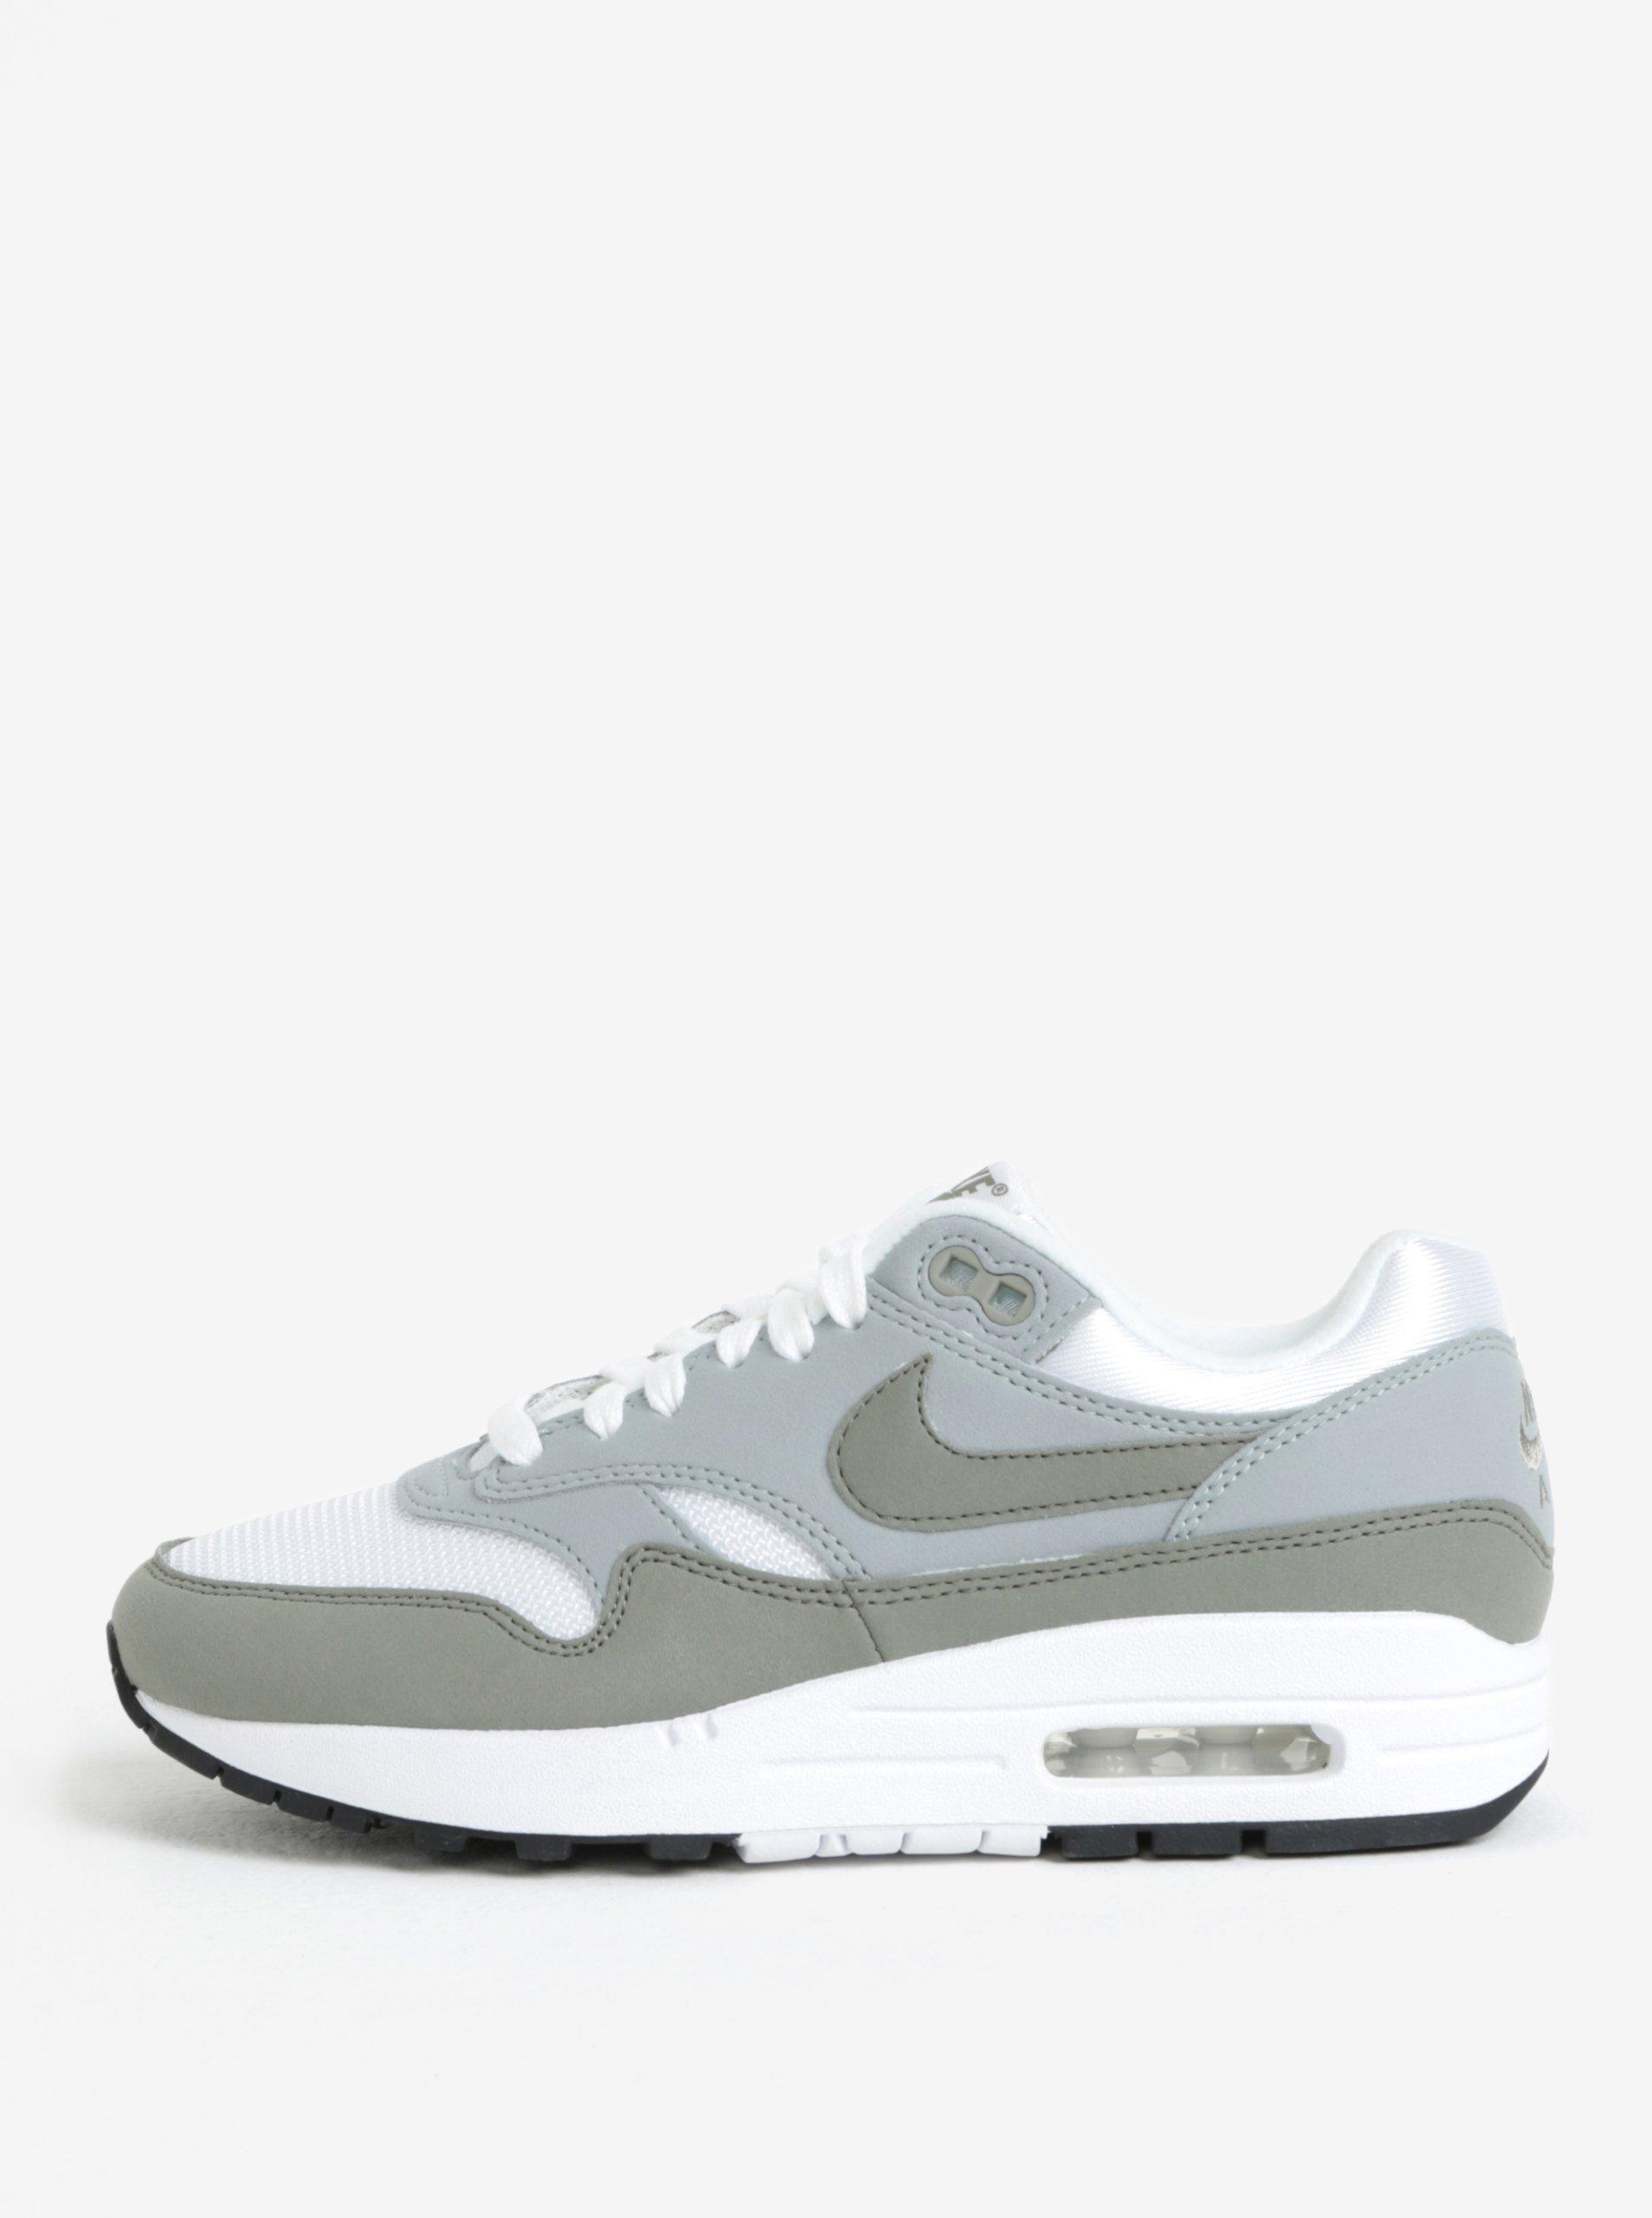 Bílo-šedé dámské tenisky Nike Air Max 1